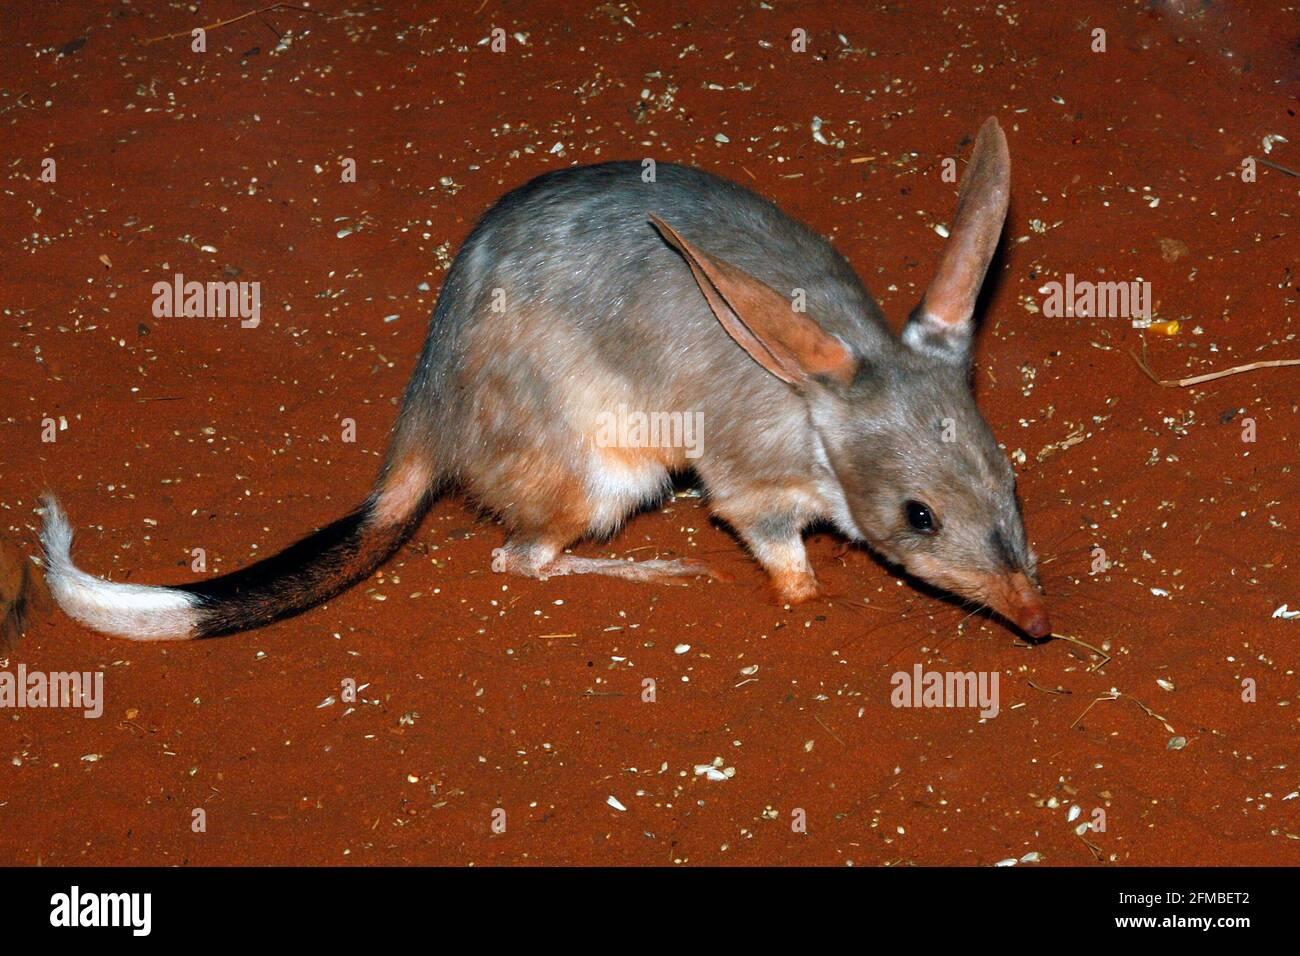 nocturnal-greater-bilby-macrotis-lagotis-scavenging-at-night-australia-2FMBET2.jpg